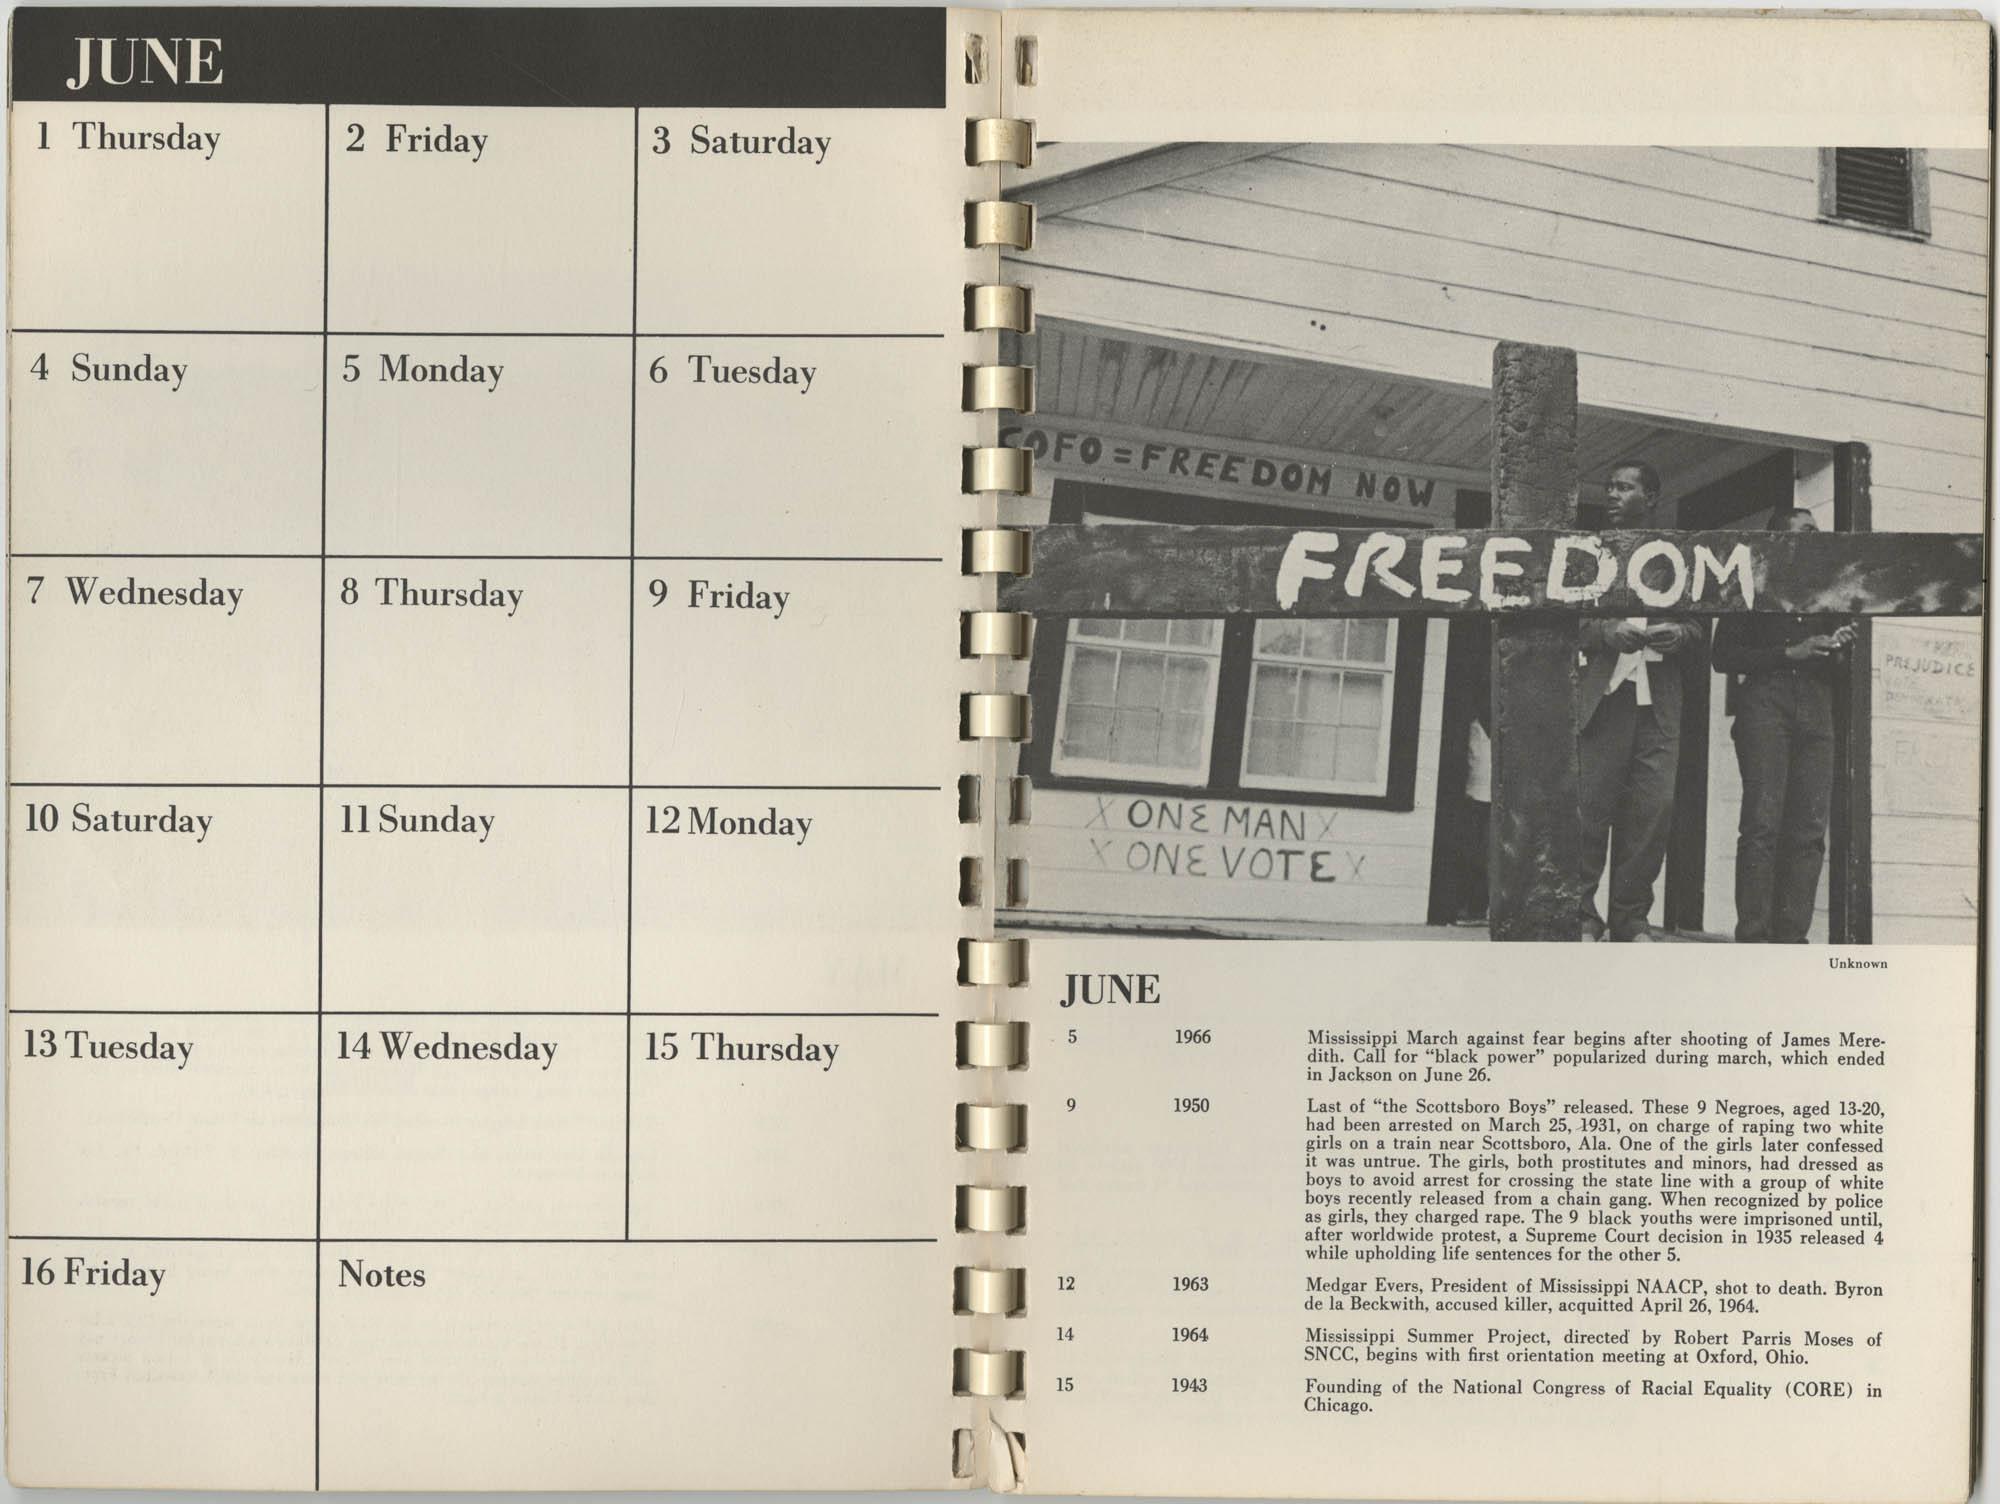 1967 SNCC Calendar, June 1-16